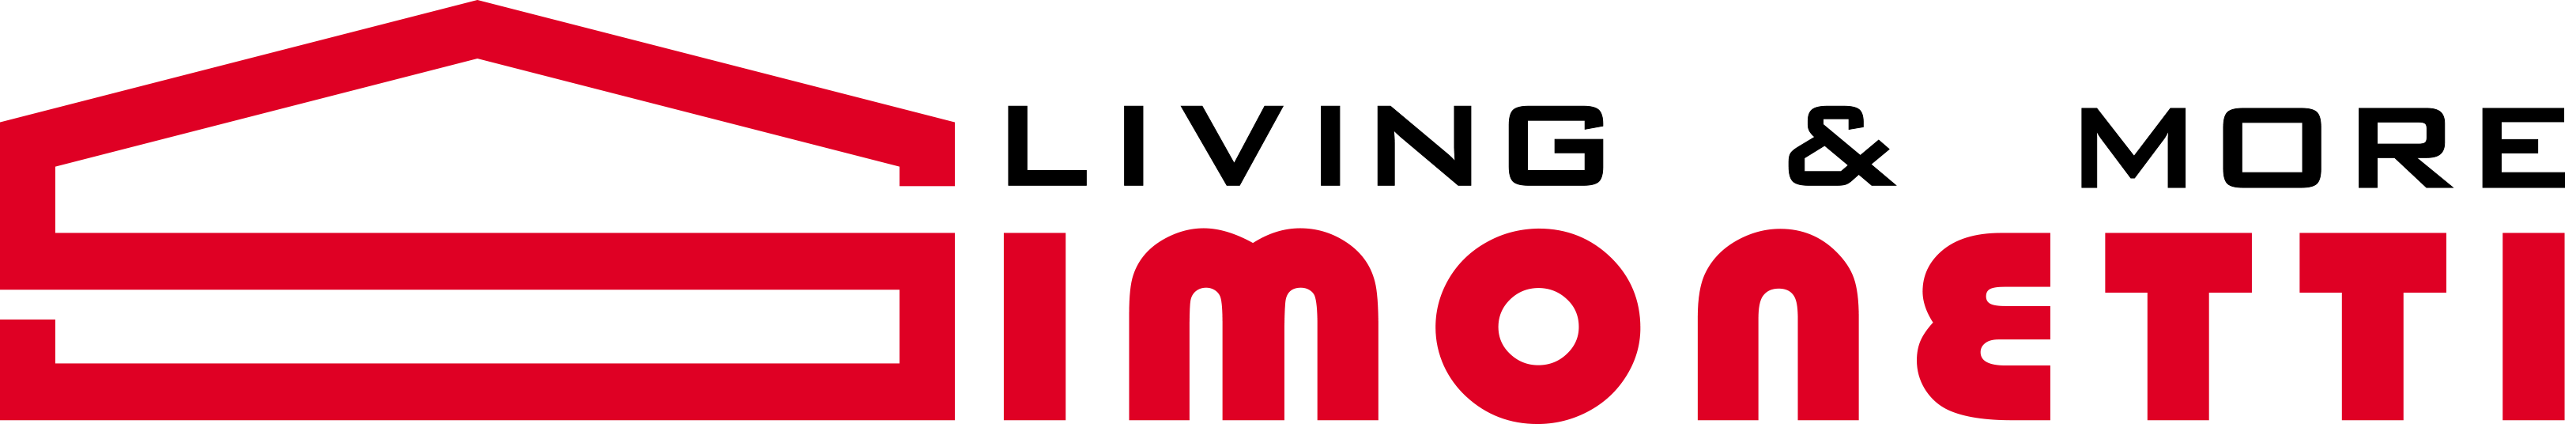 Fratelli Simonetti Spa Ancona Baraccola (AN) logo